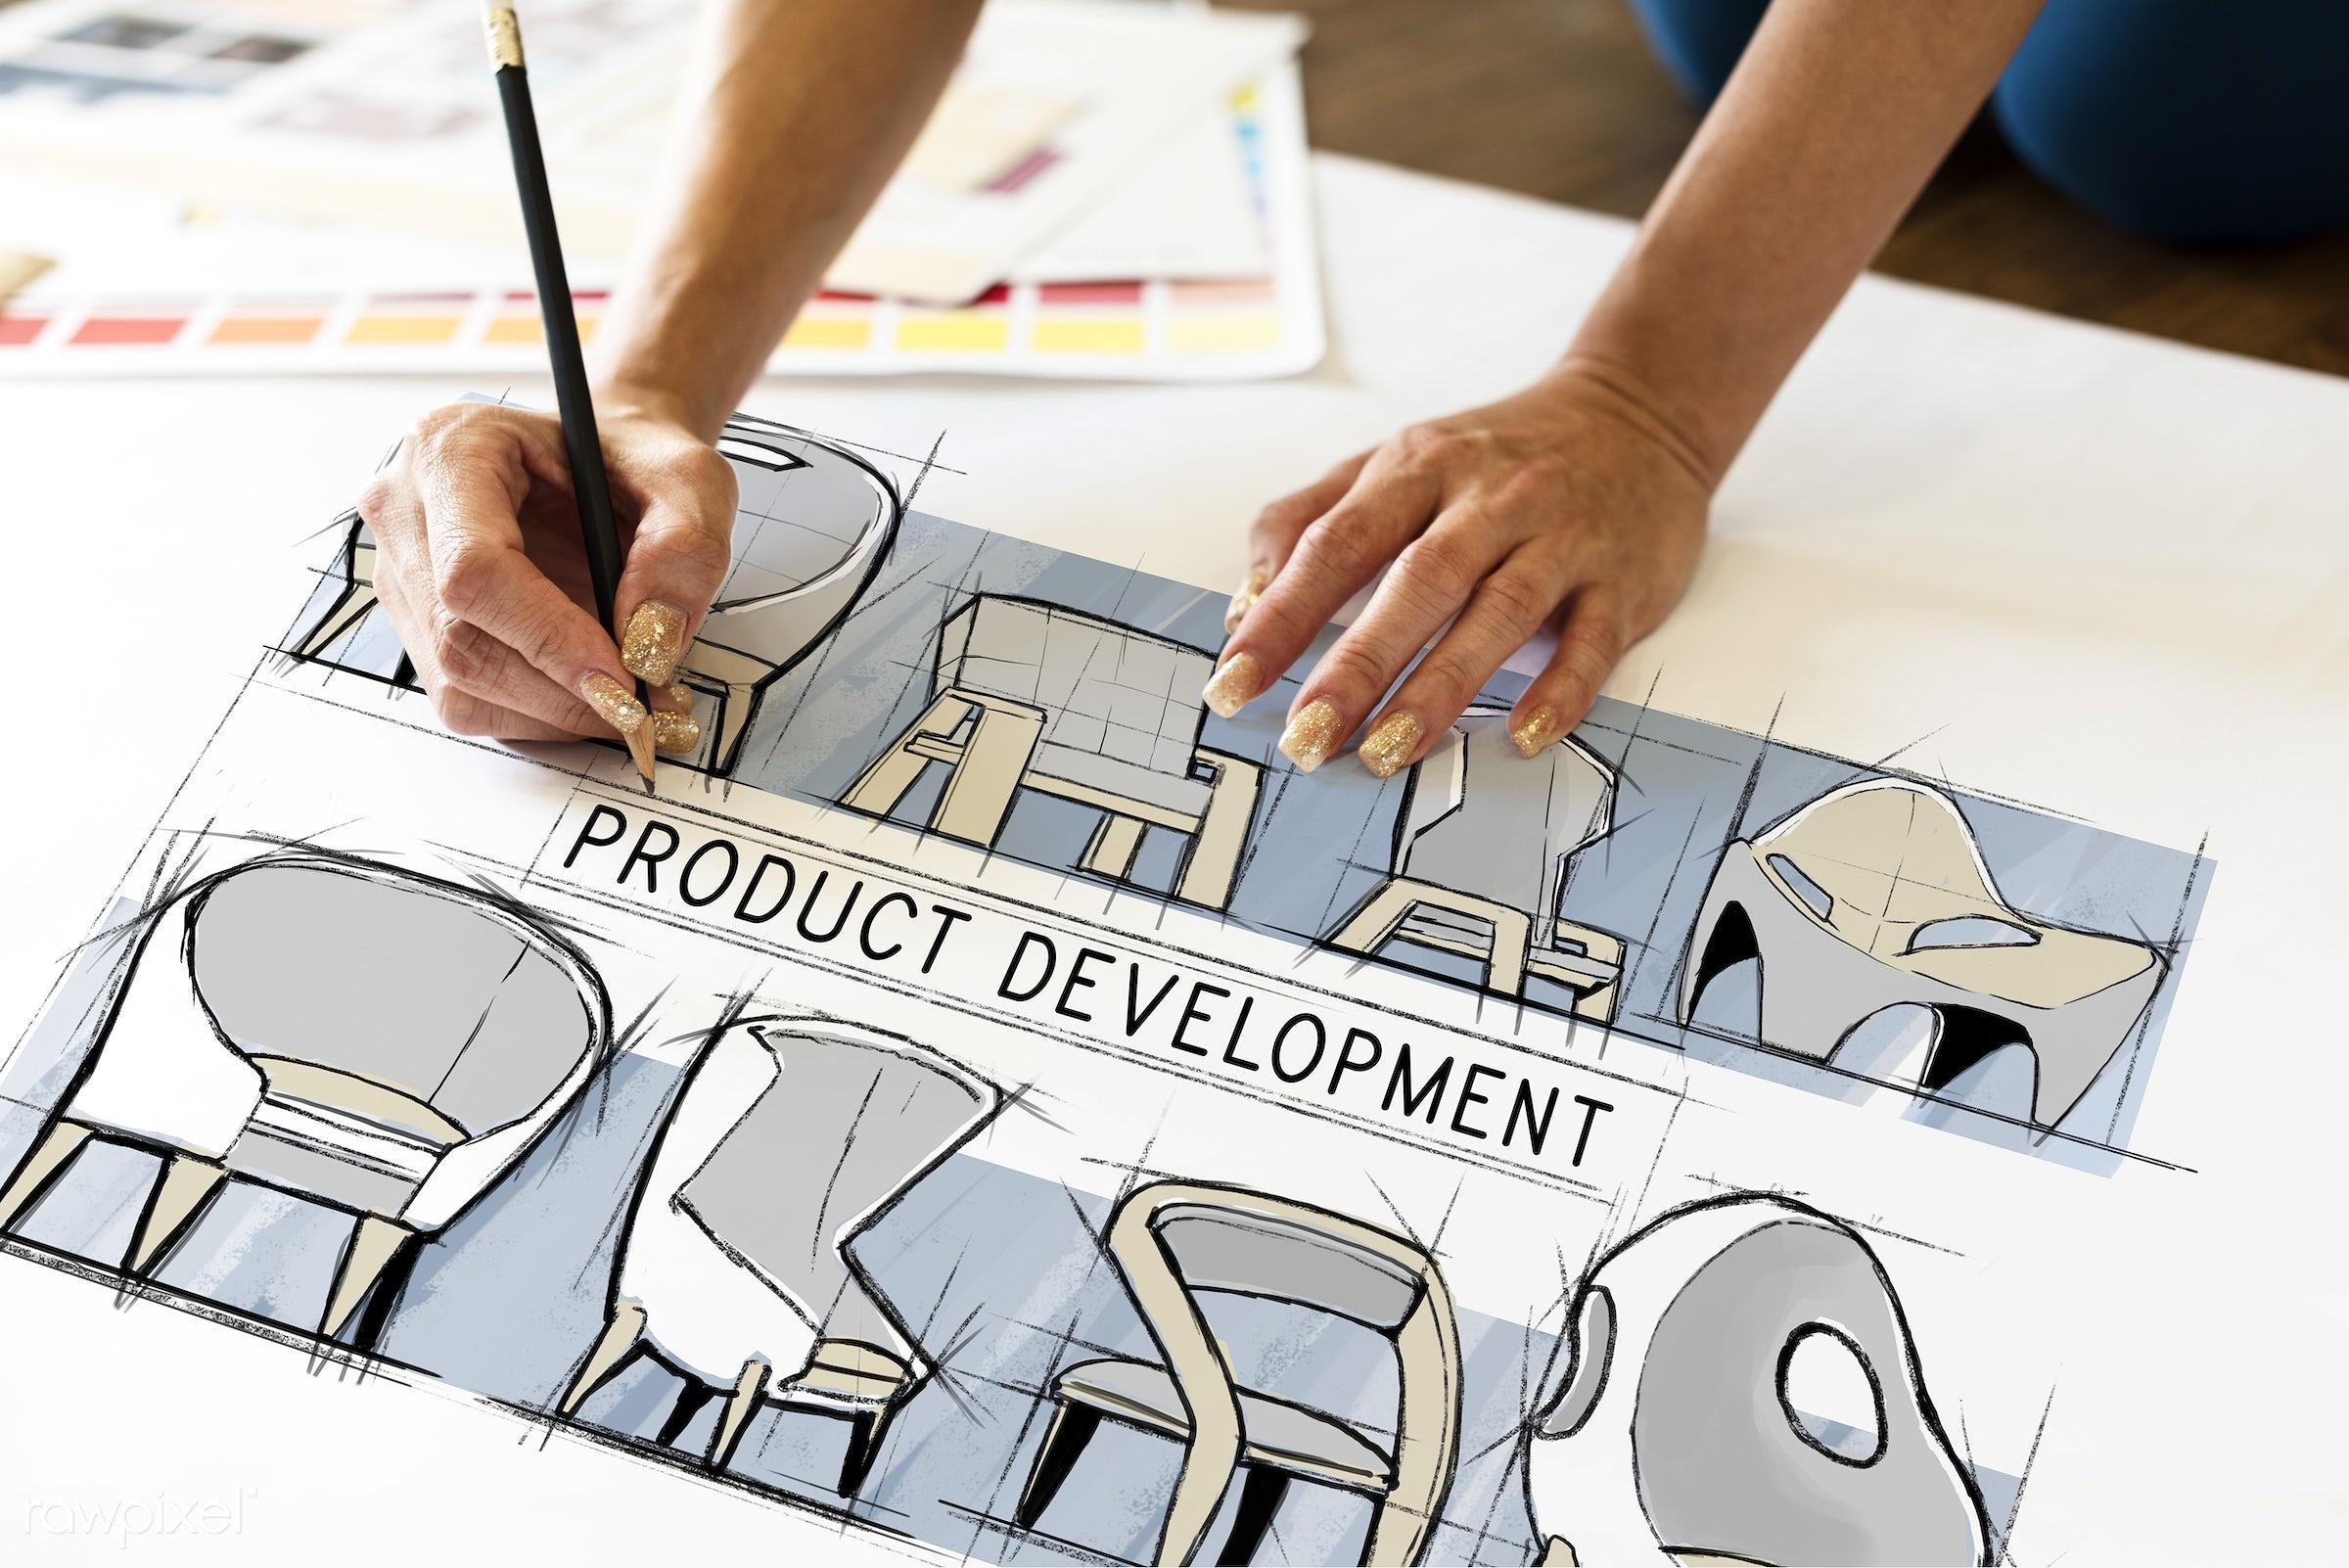 art, creation, creative, creativity, decorate, decoration, design, development, drawing, equipment, graphic, hands, home,...